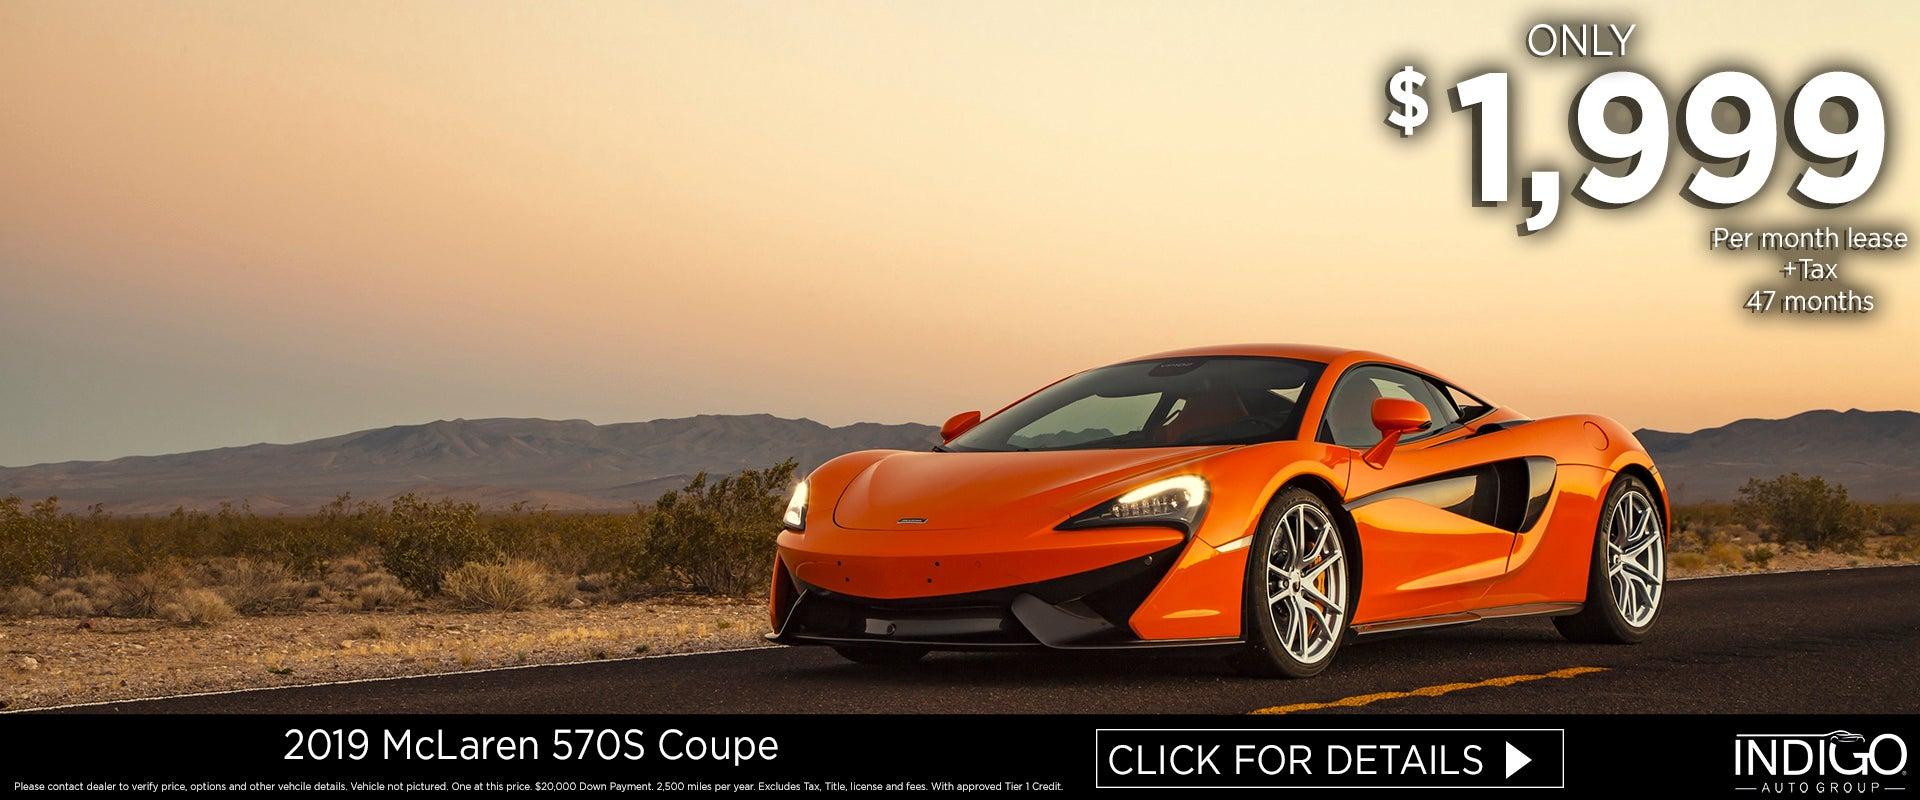 Mclaren 570s Coupe Rancho Mirage